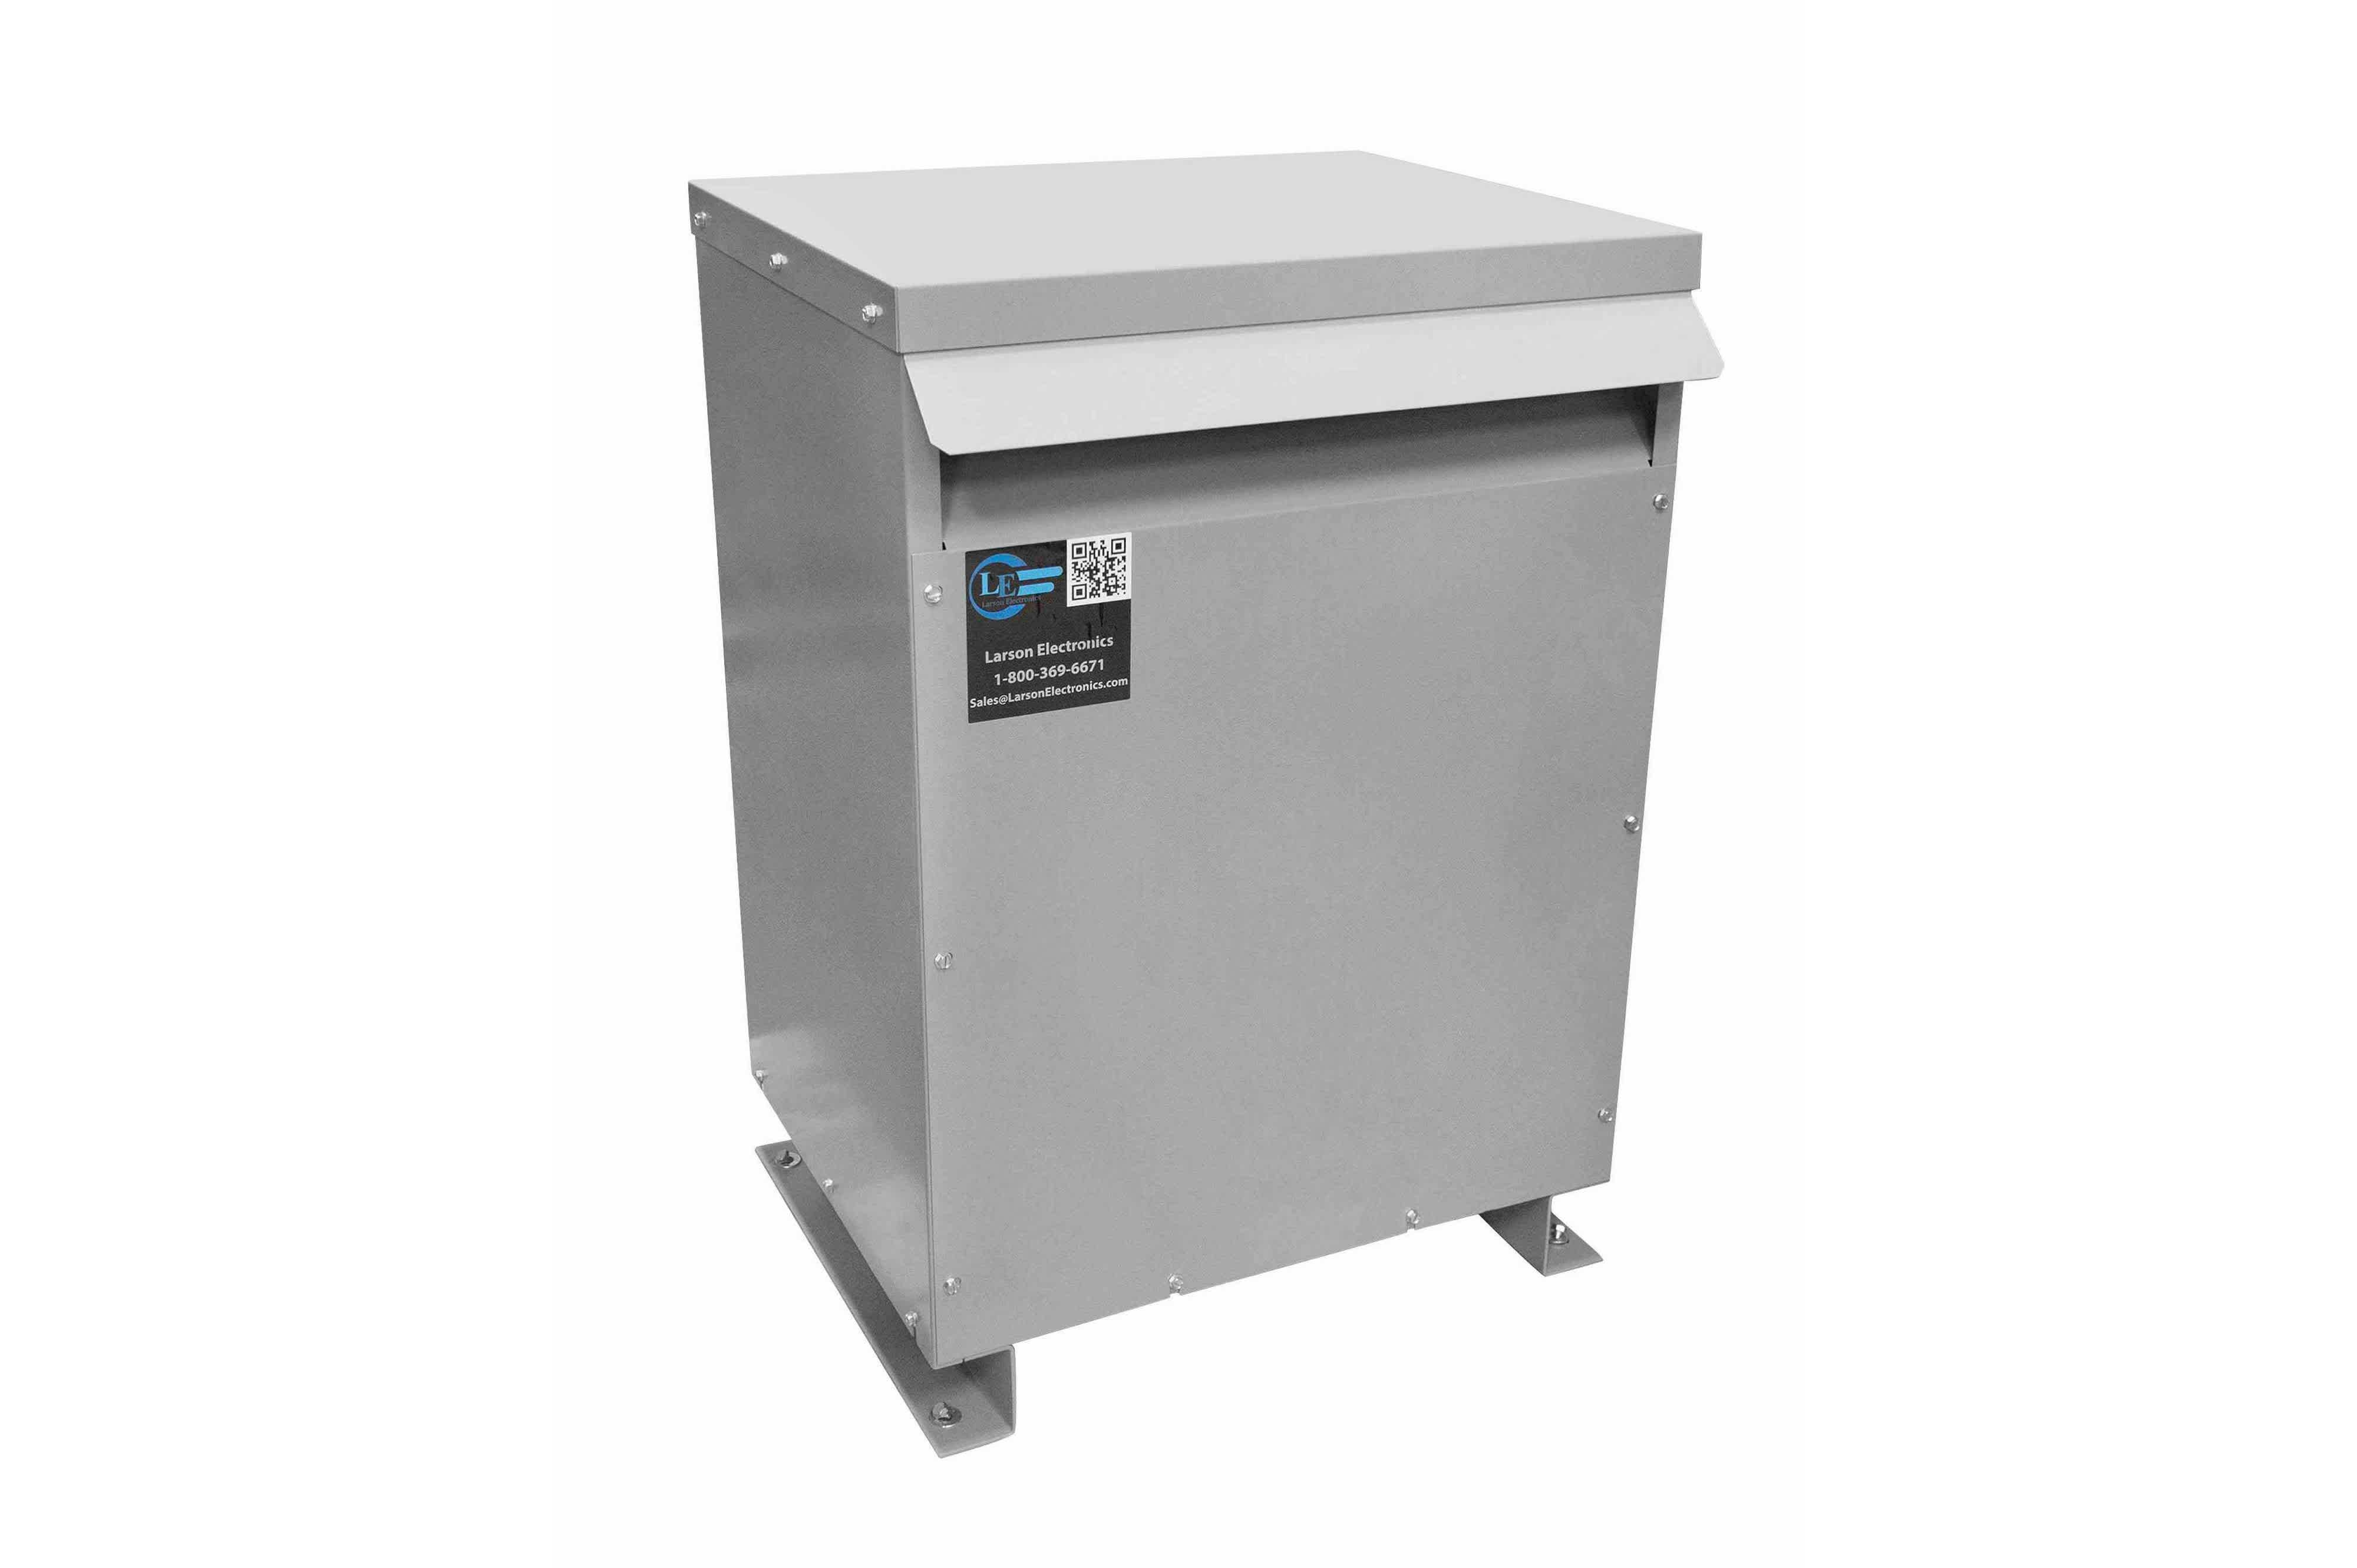 36 kVA 3PH Isolation Transformer, 208V Wye Primary, 415Y/240 Wye-N Secondary, N3R, Ventilated, 60 Hz